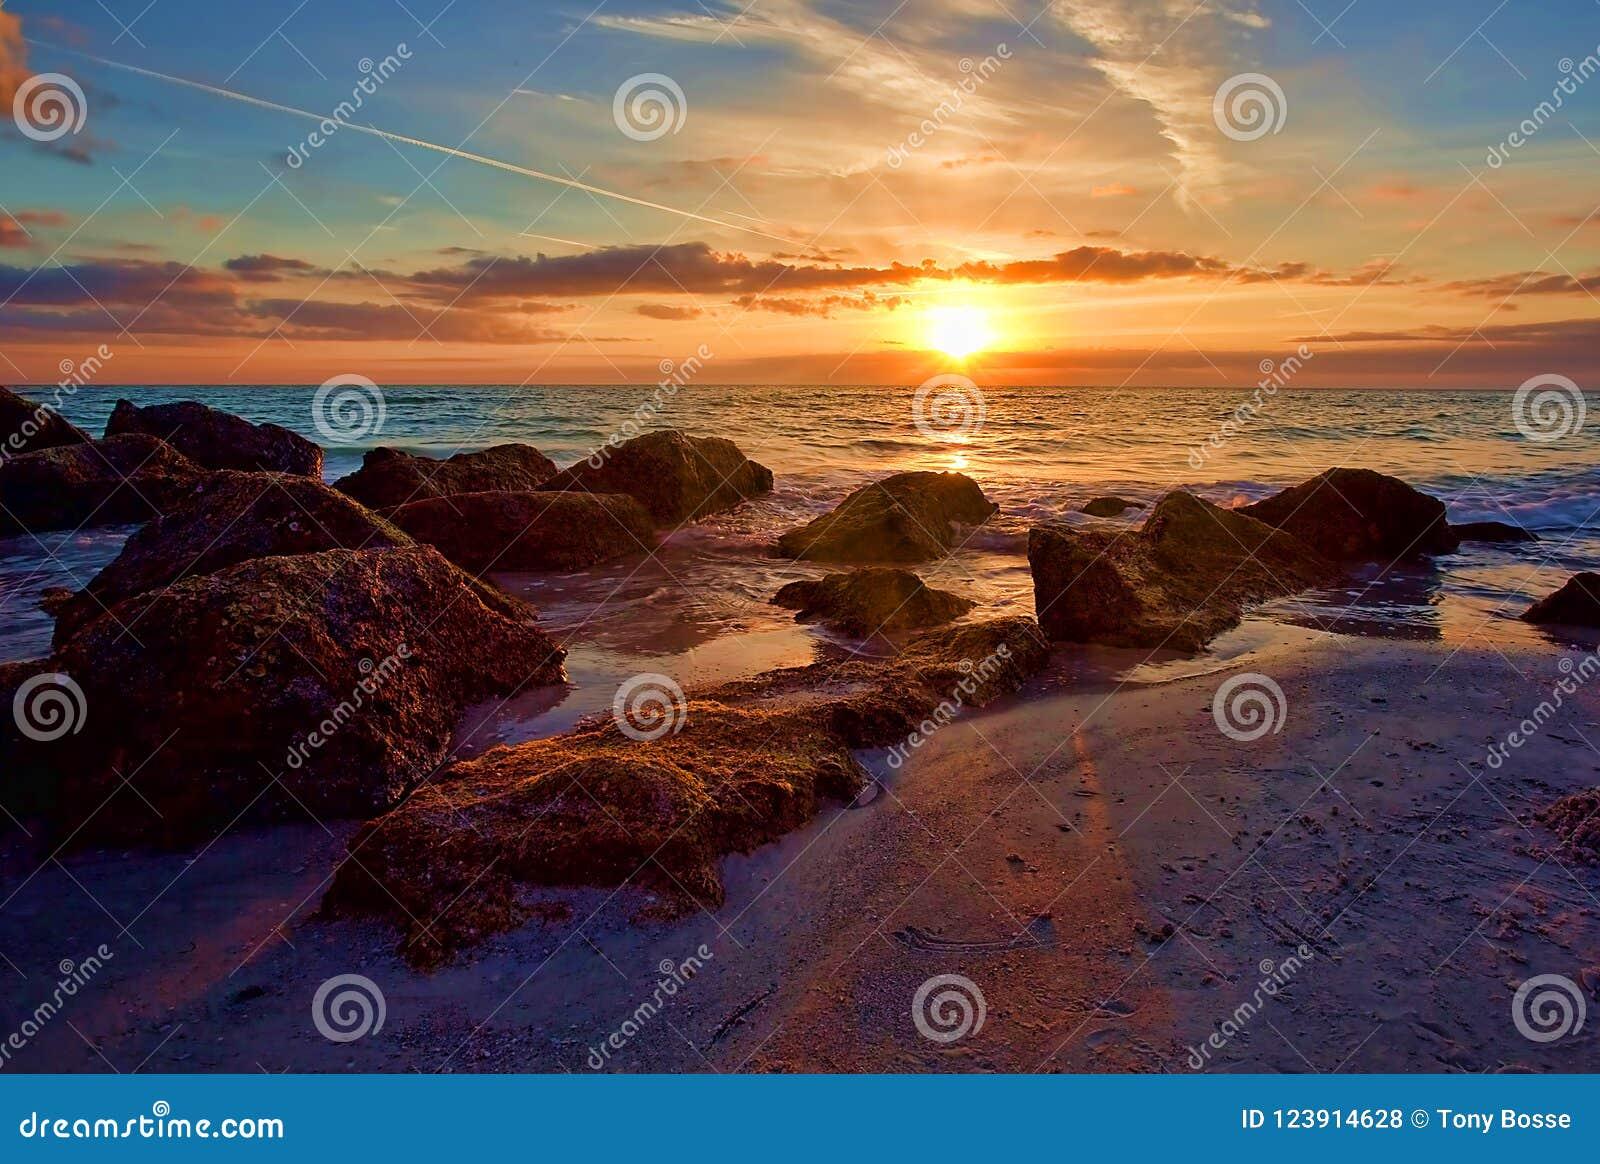 Zonsondergang met Zonnestraal over Rocky Seashore